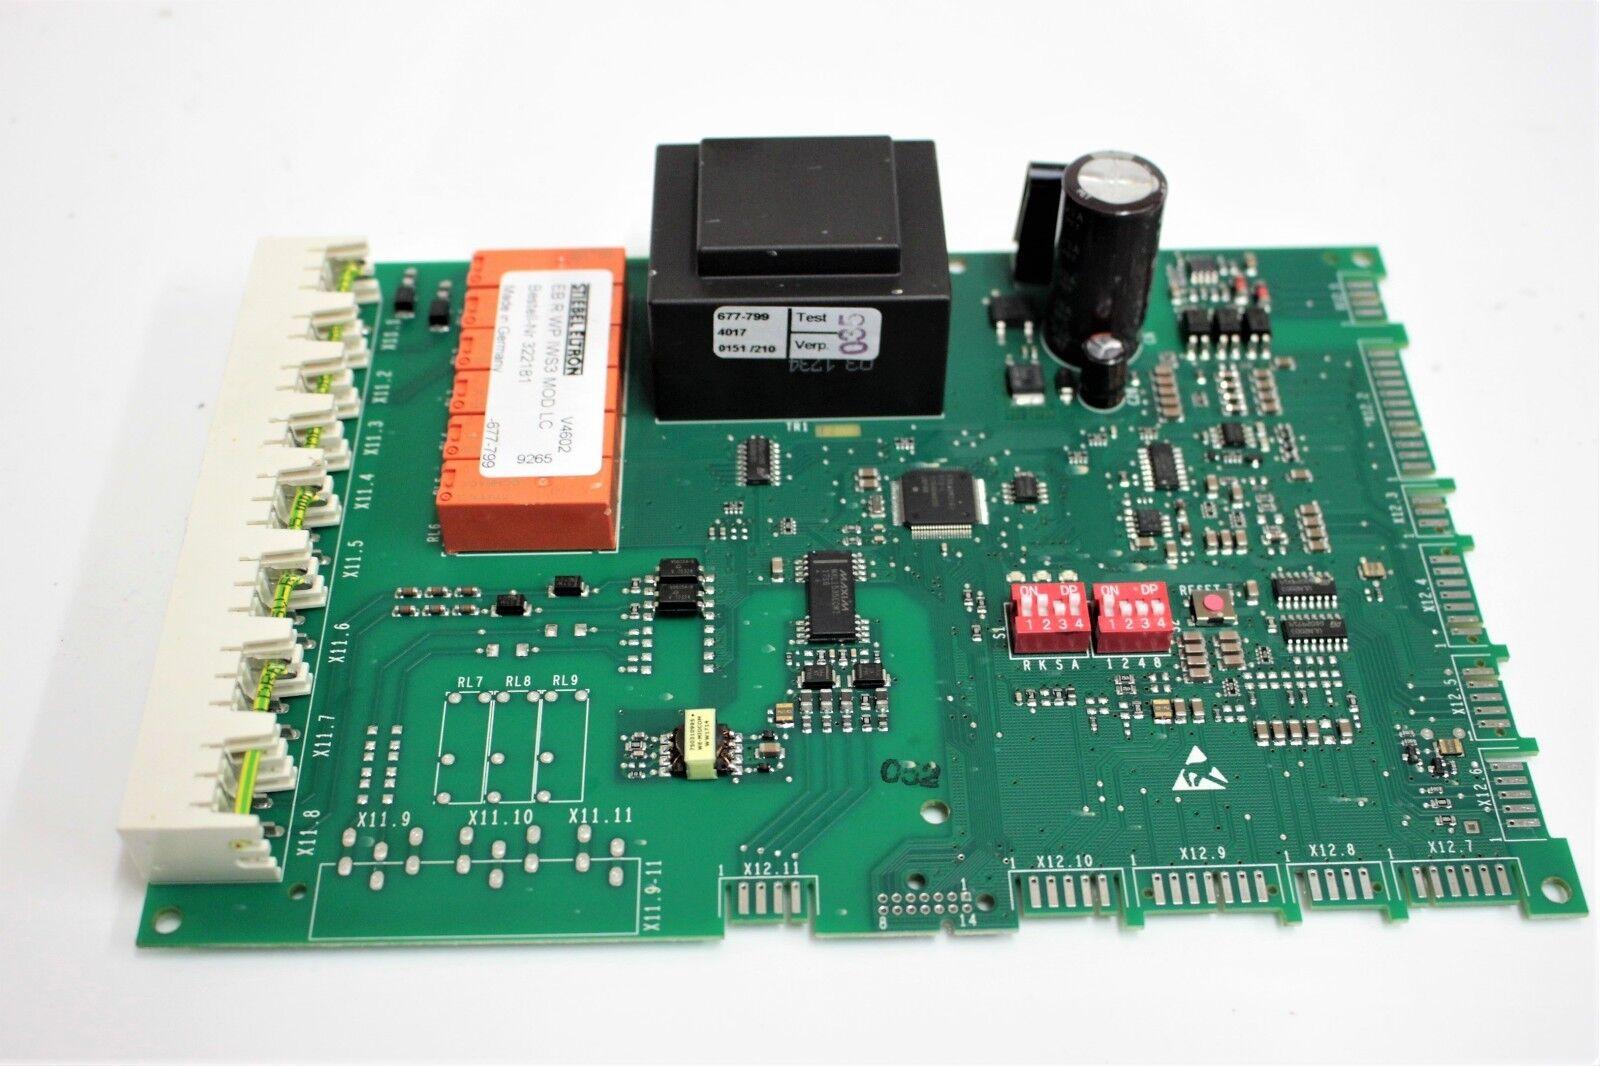 STIEBEL ELTRON ELTRON ELTRON Platine EB R WP IWS3 MOD.LC Nr. 322181 / 677-799 / 4017 0151/210 1d621d